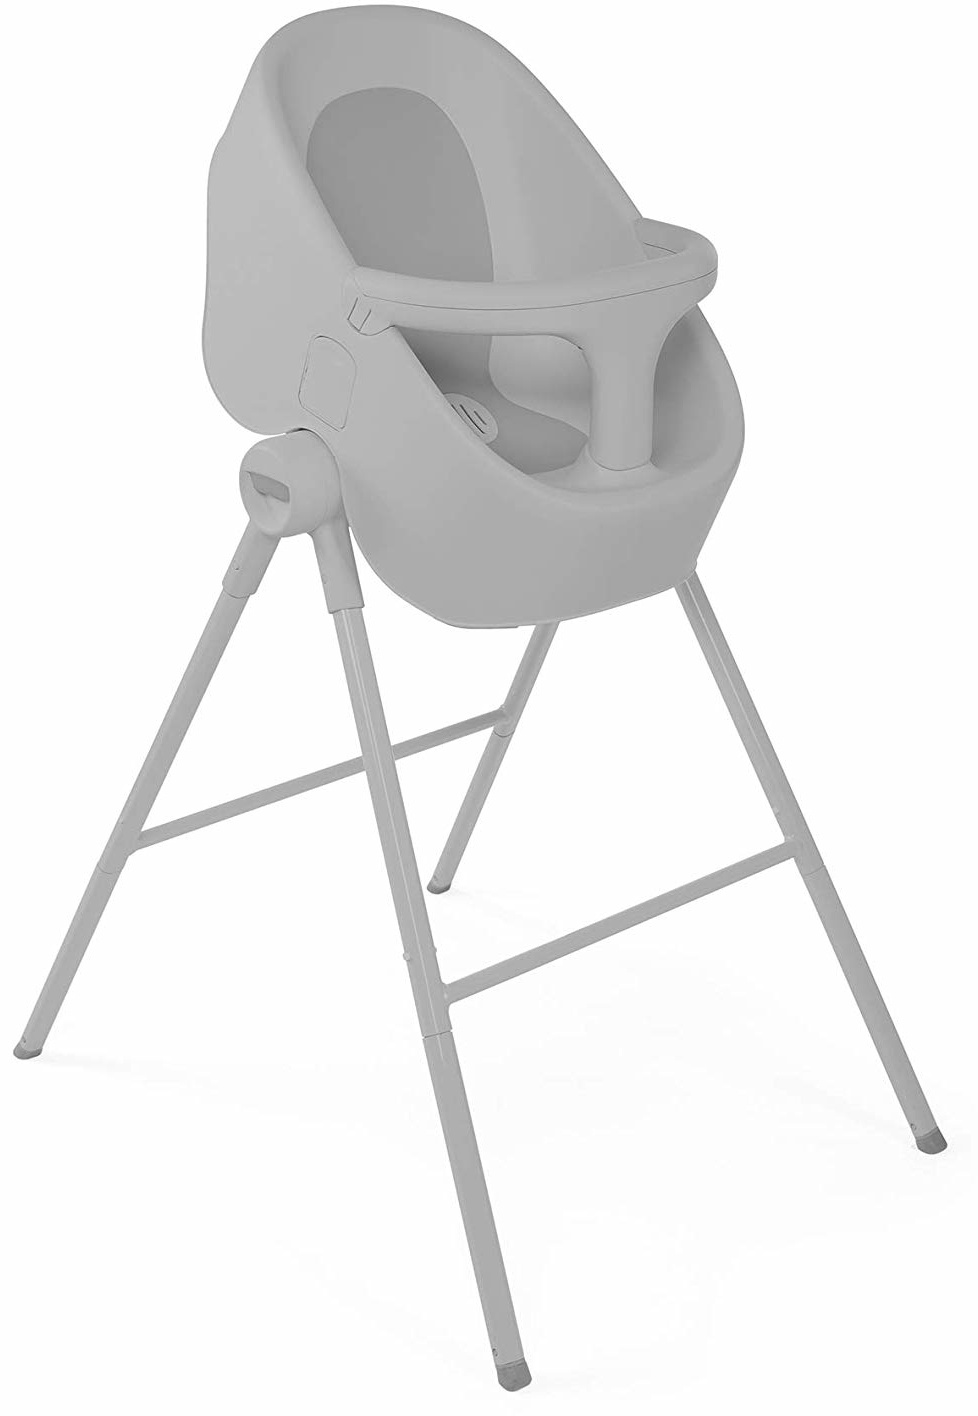 Стульчик для купания Chicco Bubble Nest серый